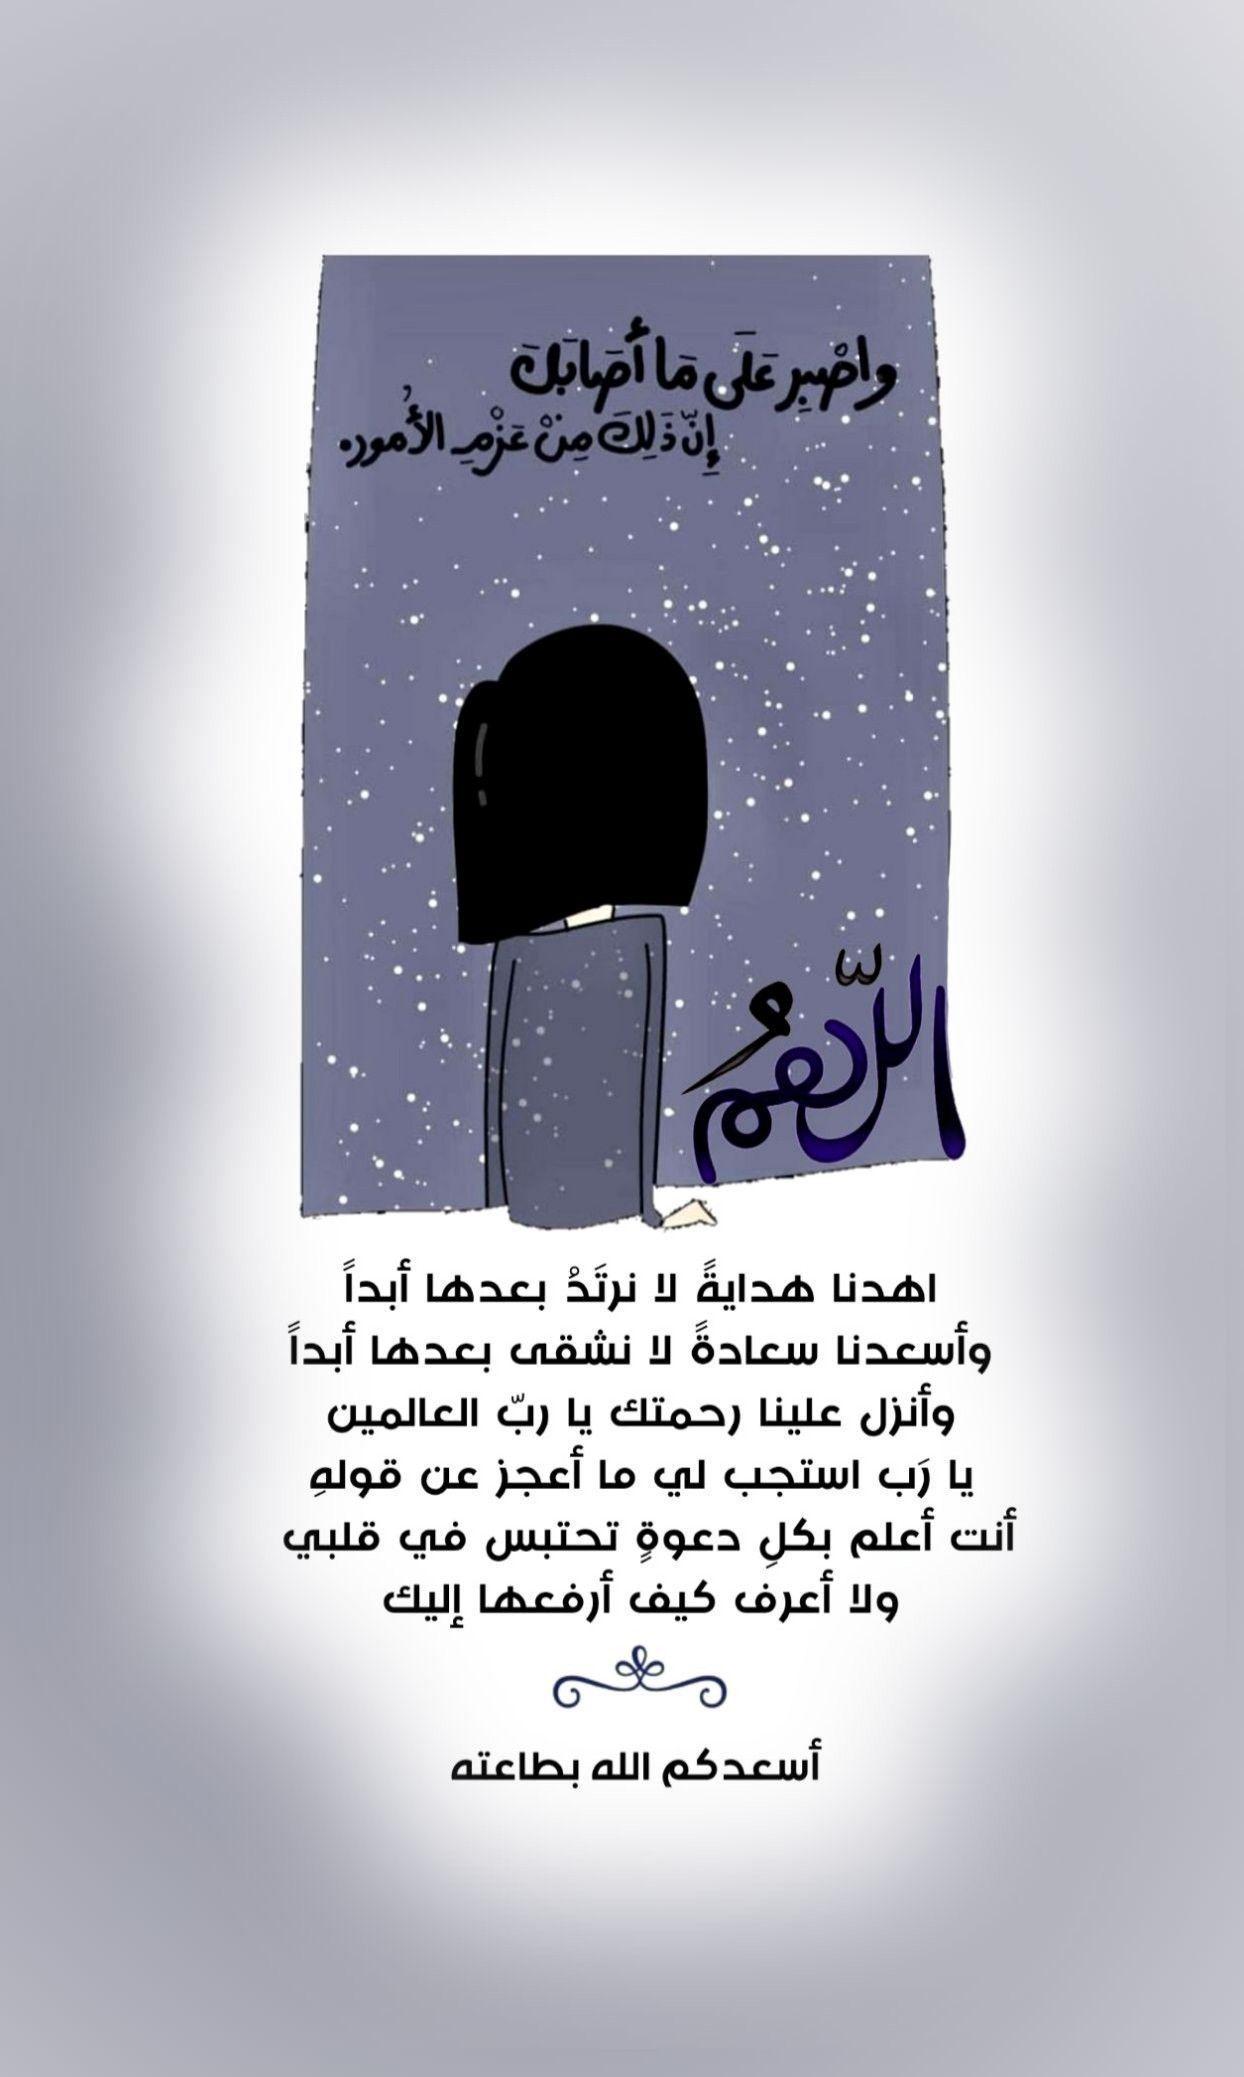 أسعد الله يومكم وحفظكم Have A Nice Day Beautiful Quran Quotes Good Morning Greetings Islamic Inspirational Quotes